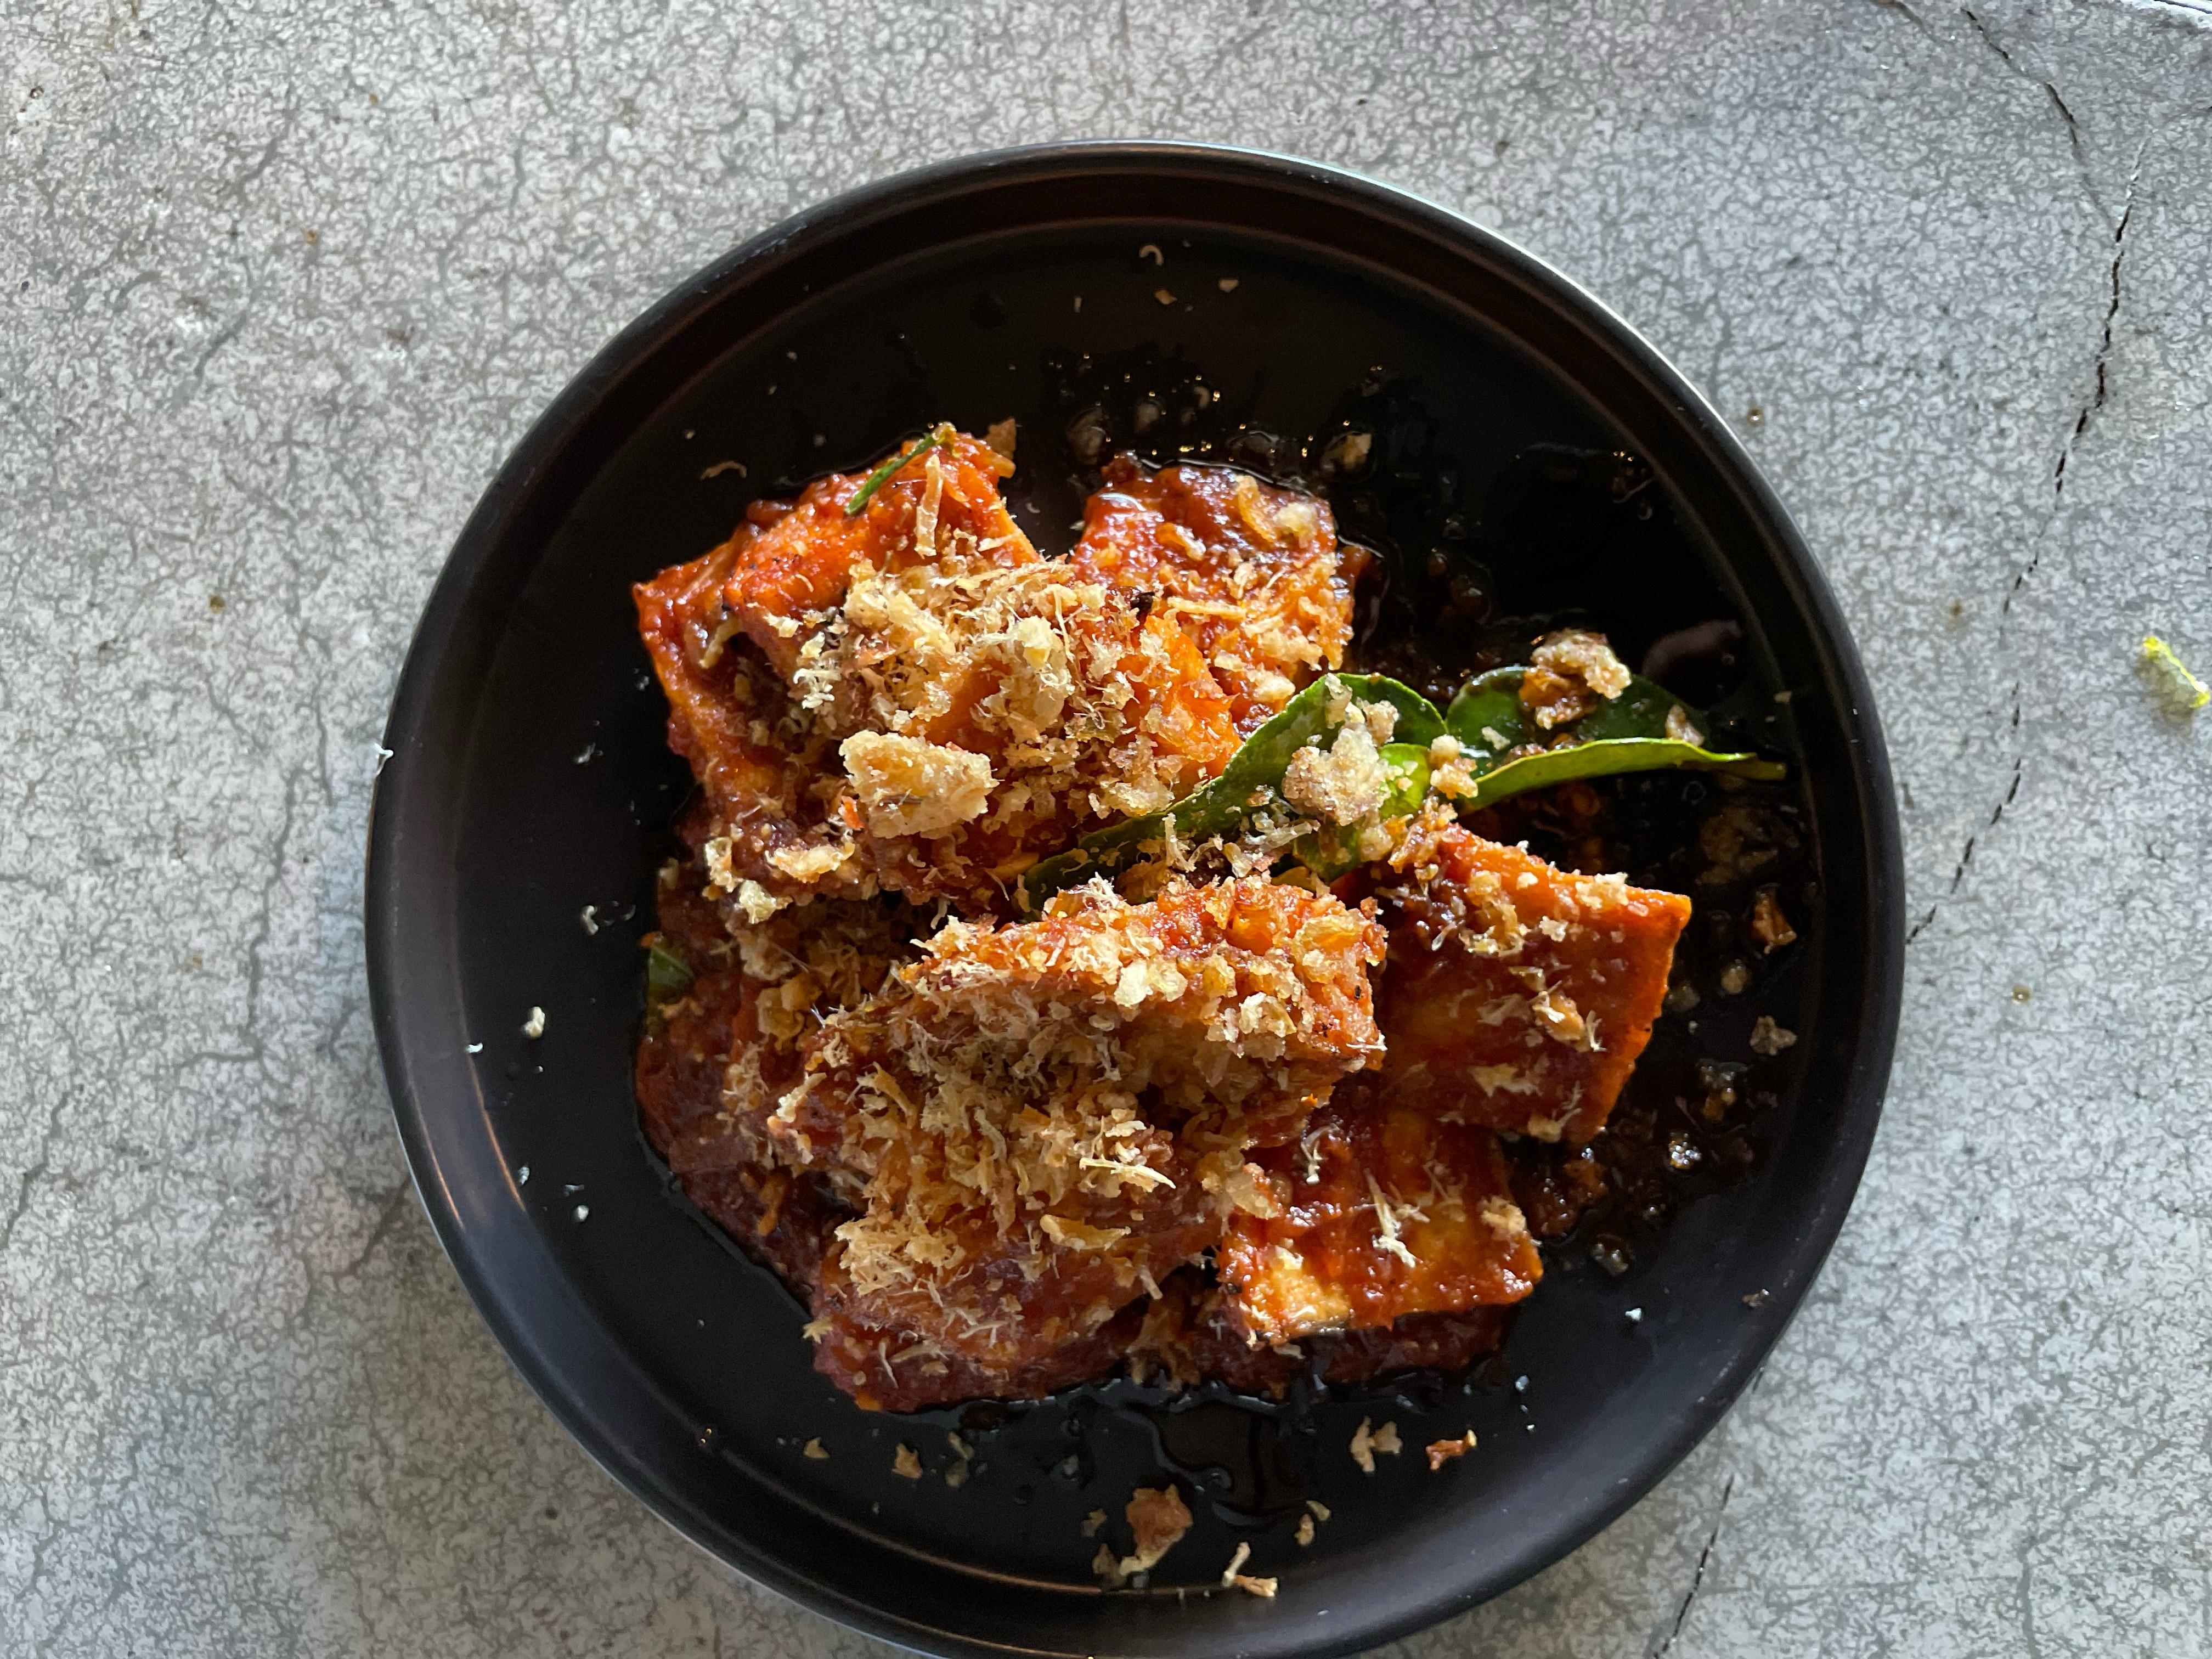 Tofu, tomato and shrimp floss from Hoxton Manor